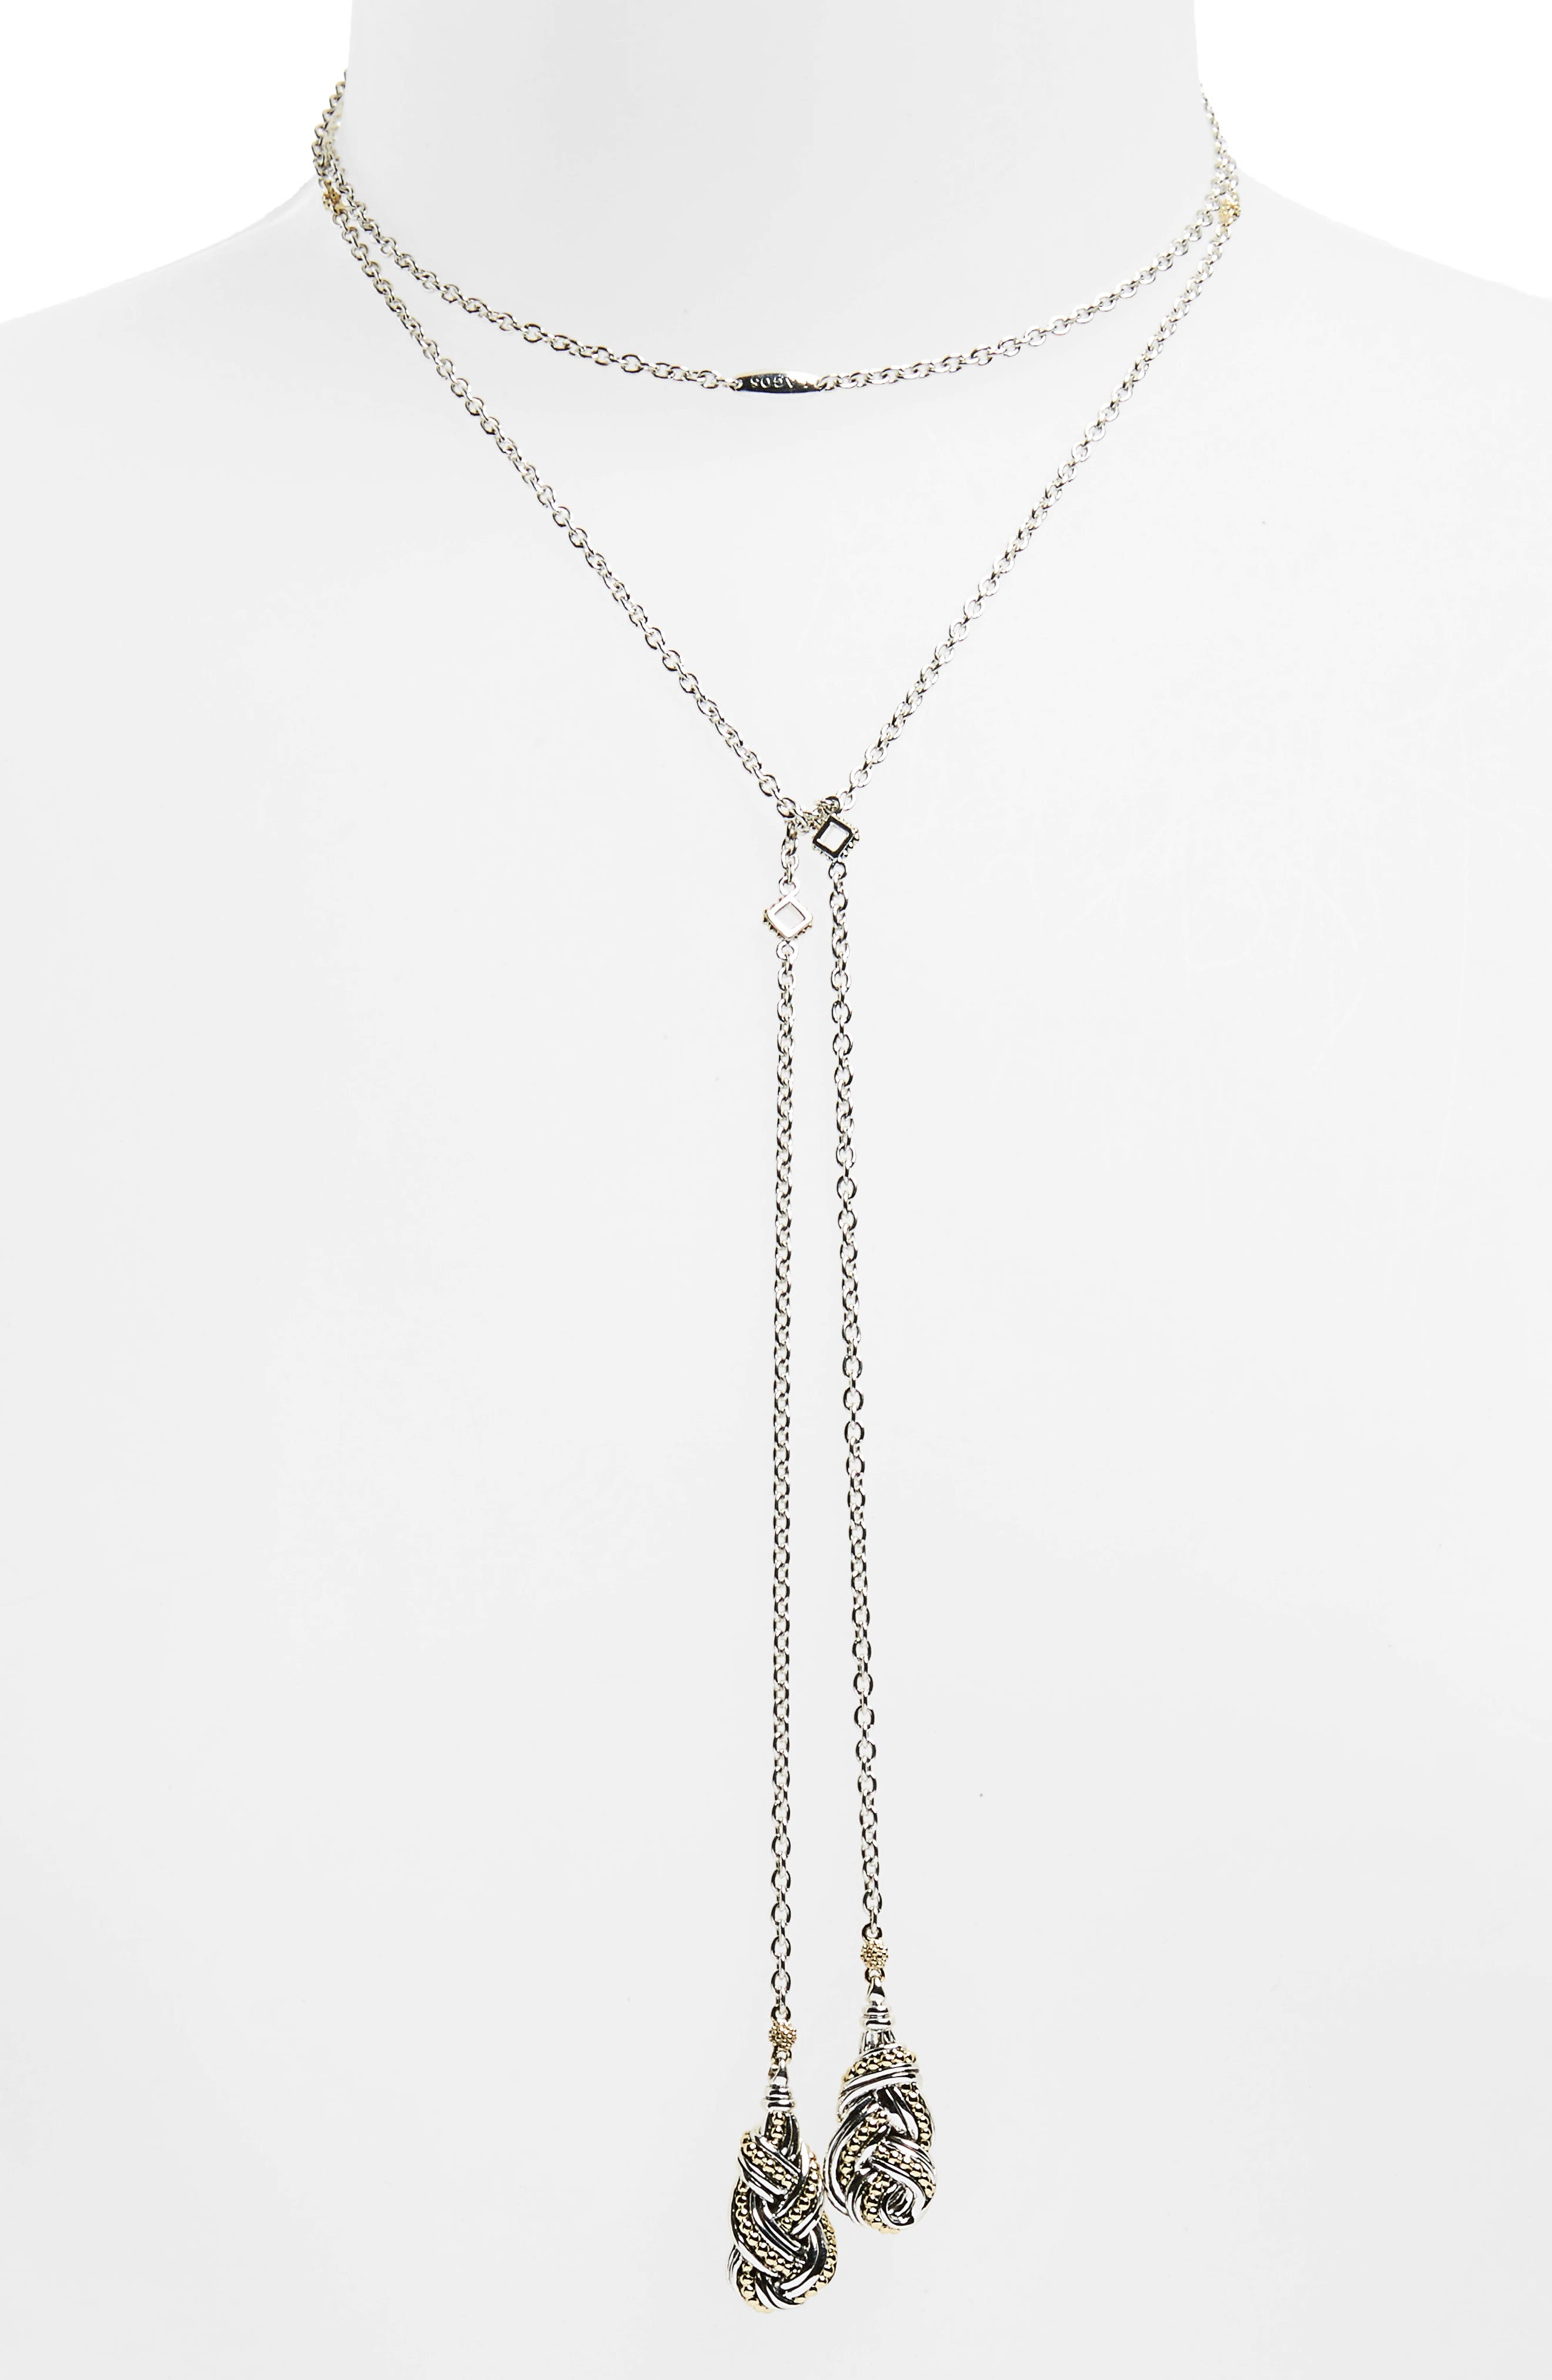 Alternate Image 1 Selected - LAGOS Torsade Lariat Necklace